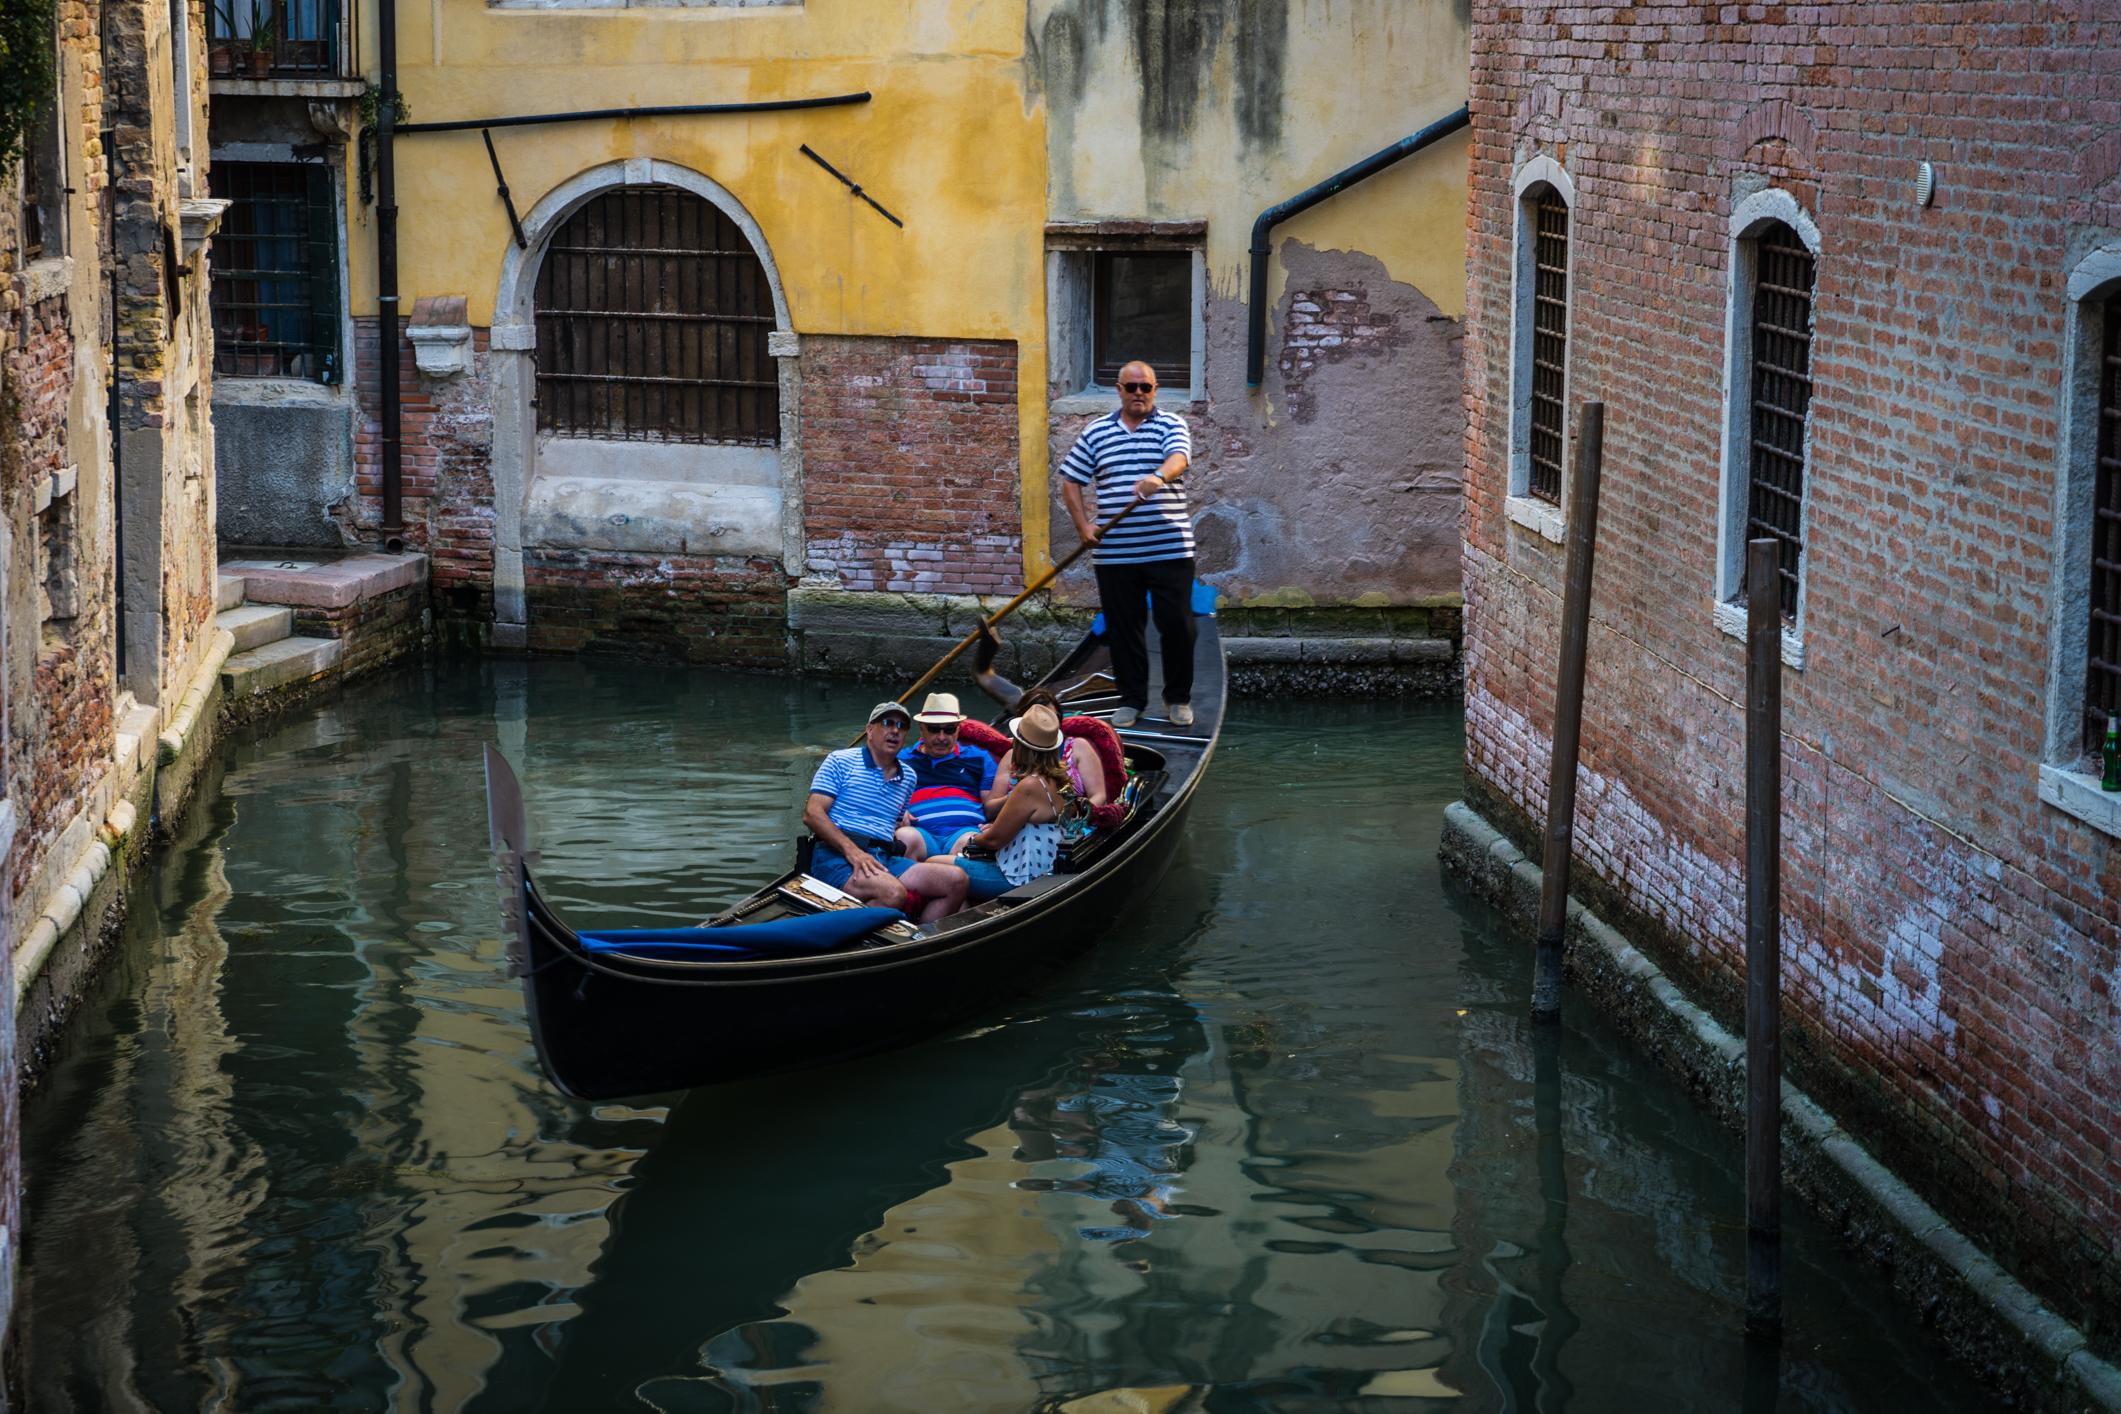 Italy-Venice-gondola-with-tourists.jpg